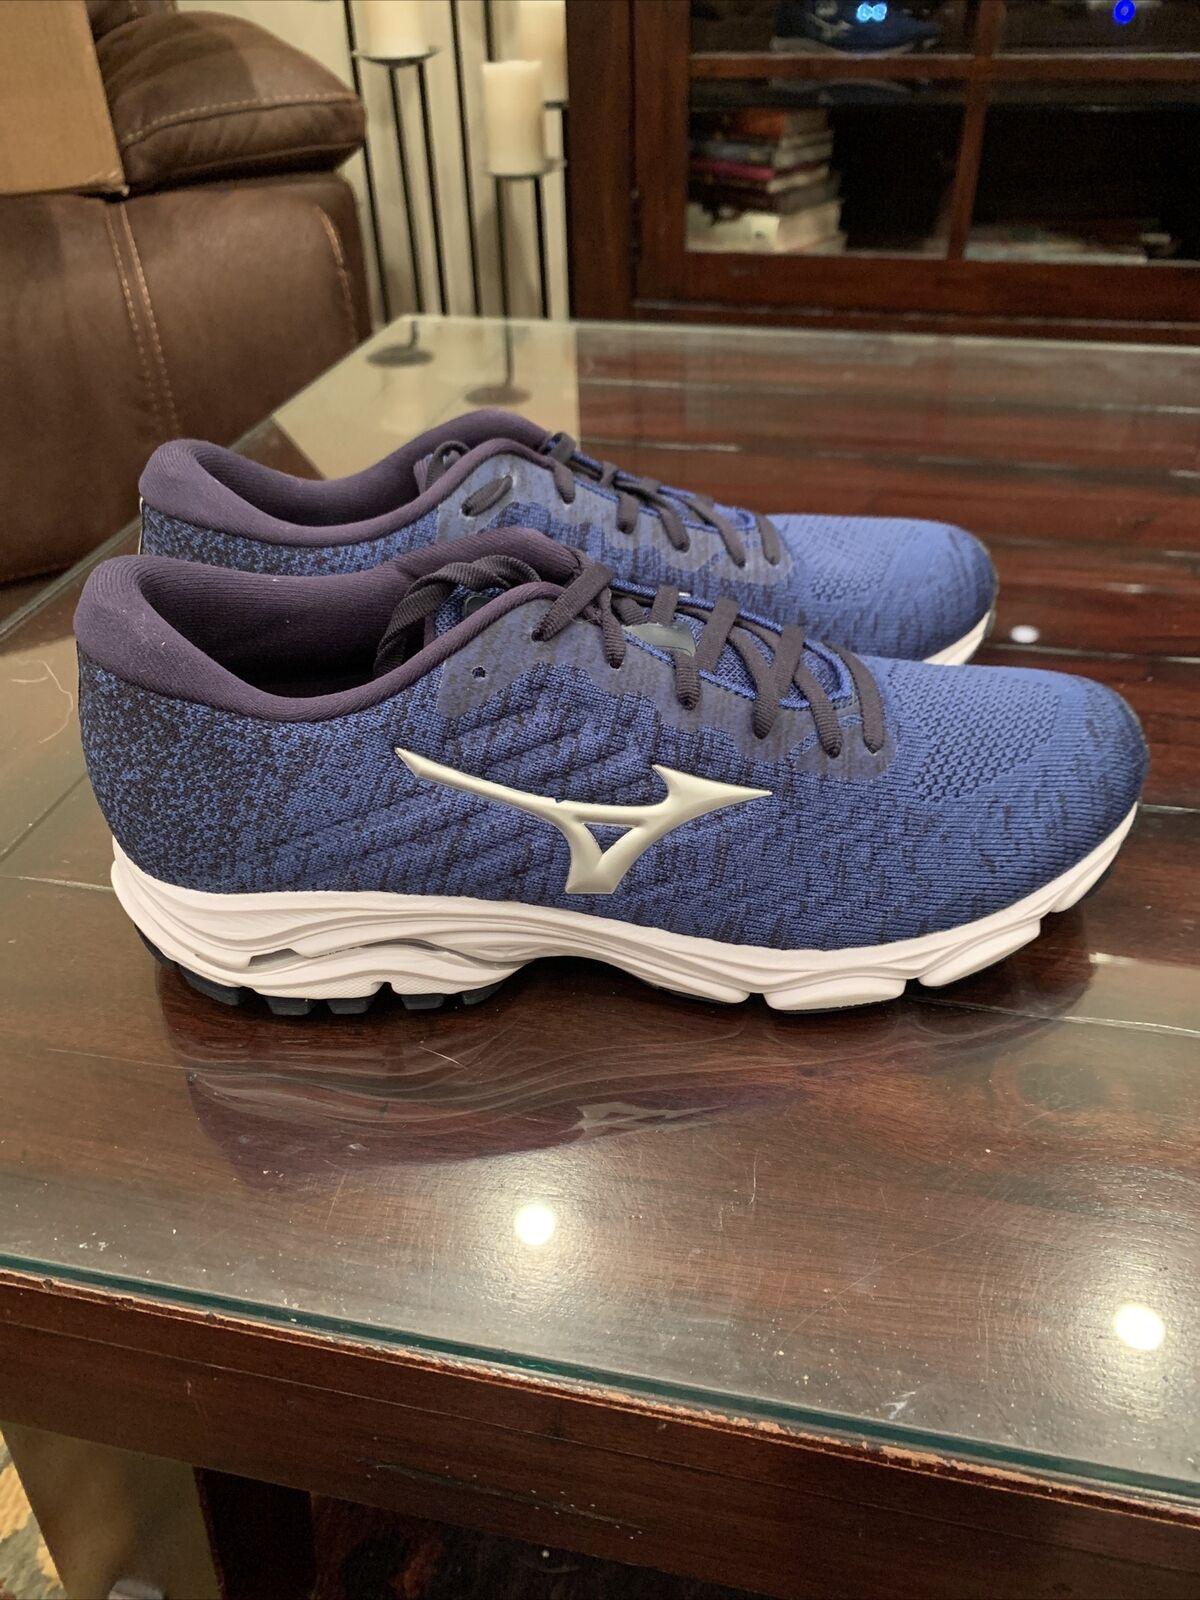 Mizuno Wave Inspire Waveknit Men Running Shoes Blue/Black Sz 9 D EU 42